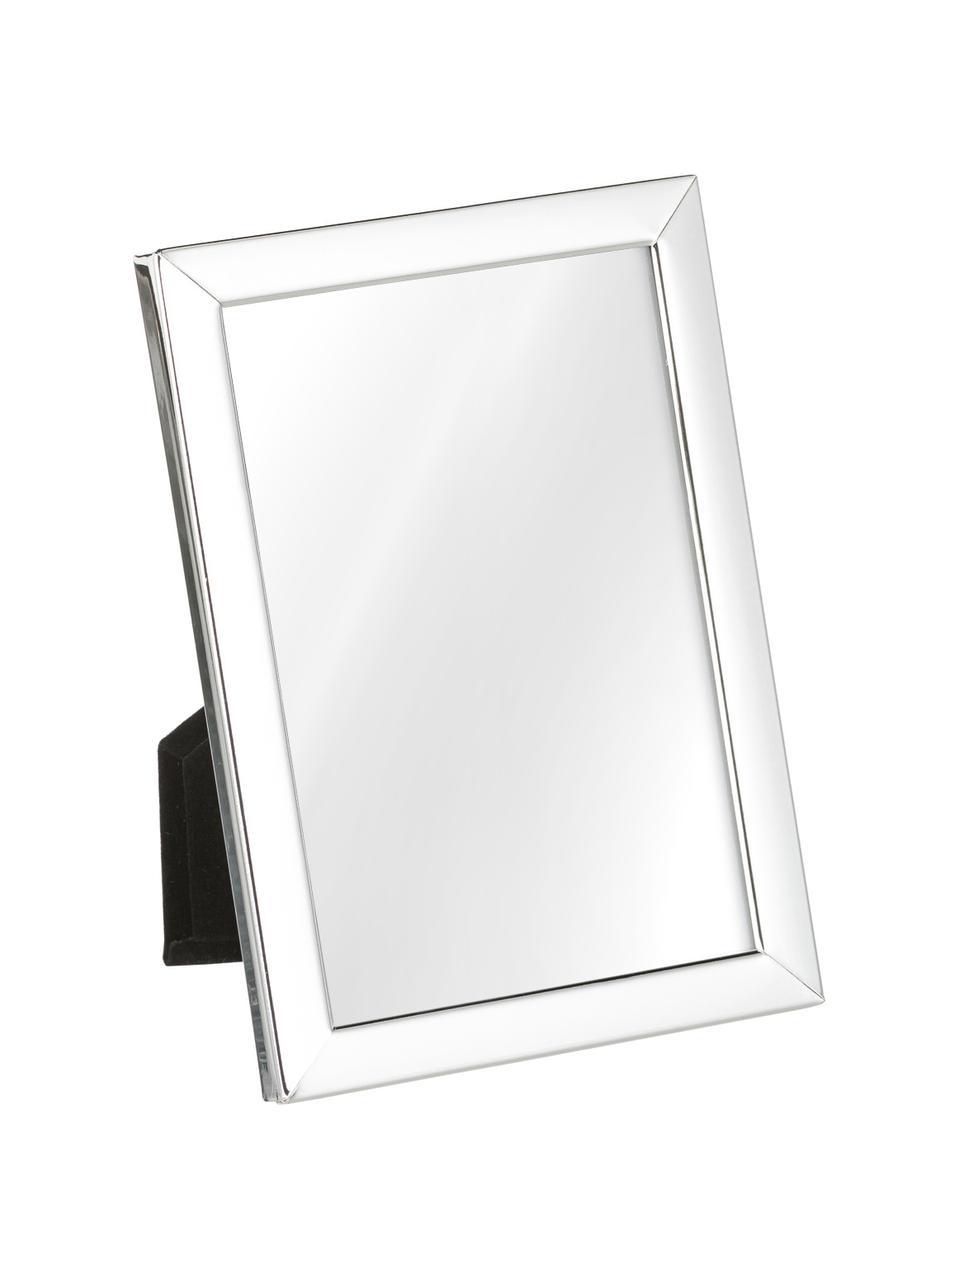 Ramka na zdjęcia Aosta, Srebrny, 13 x 18 cm